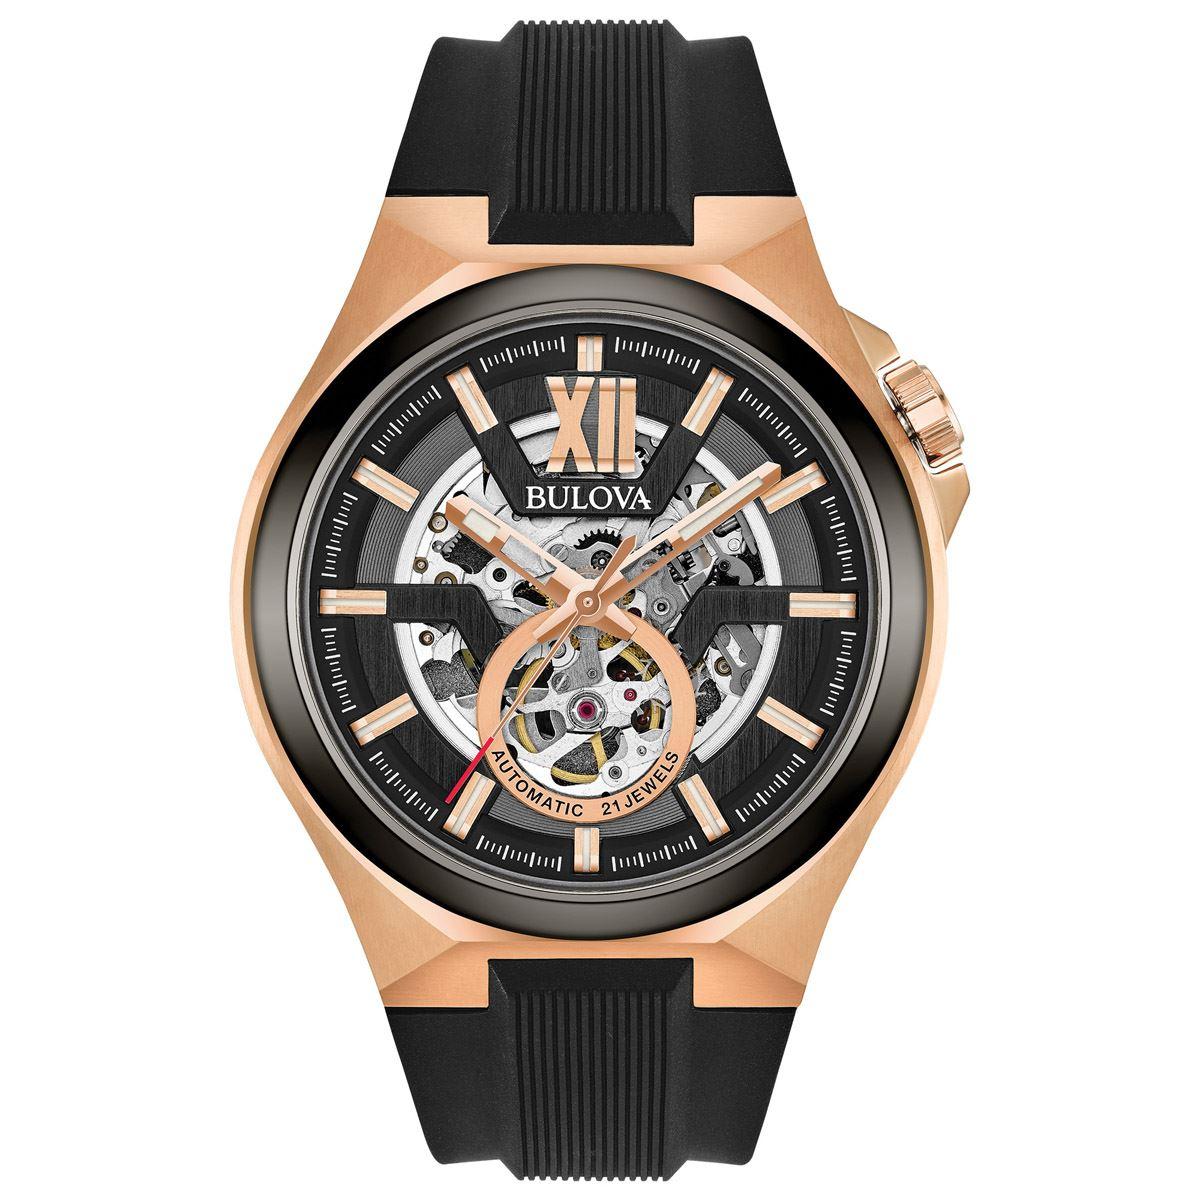 Reloj Bulova Mecánico de Cuerda Automática para Caballero 98A177